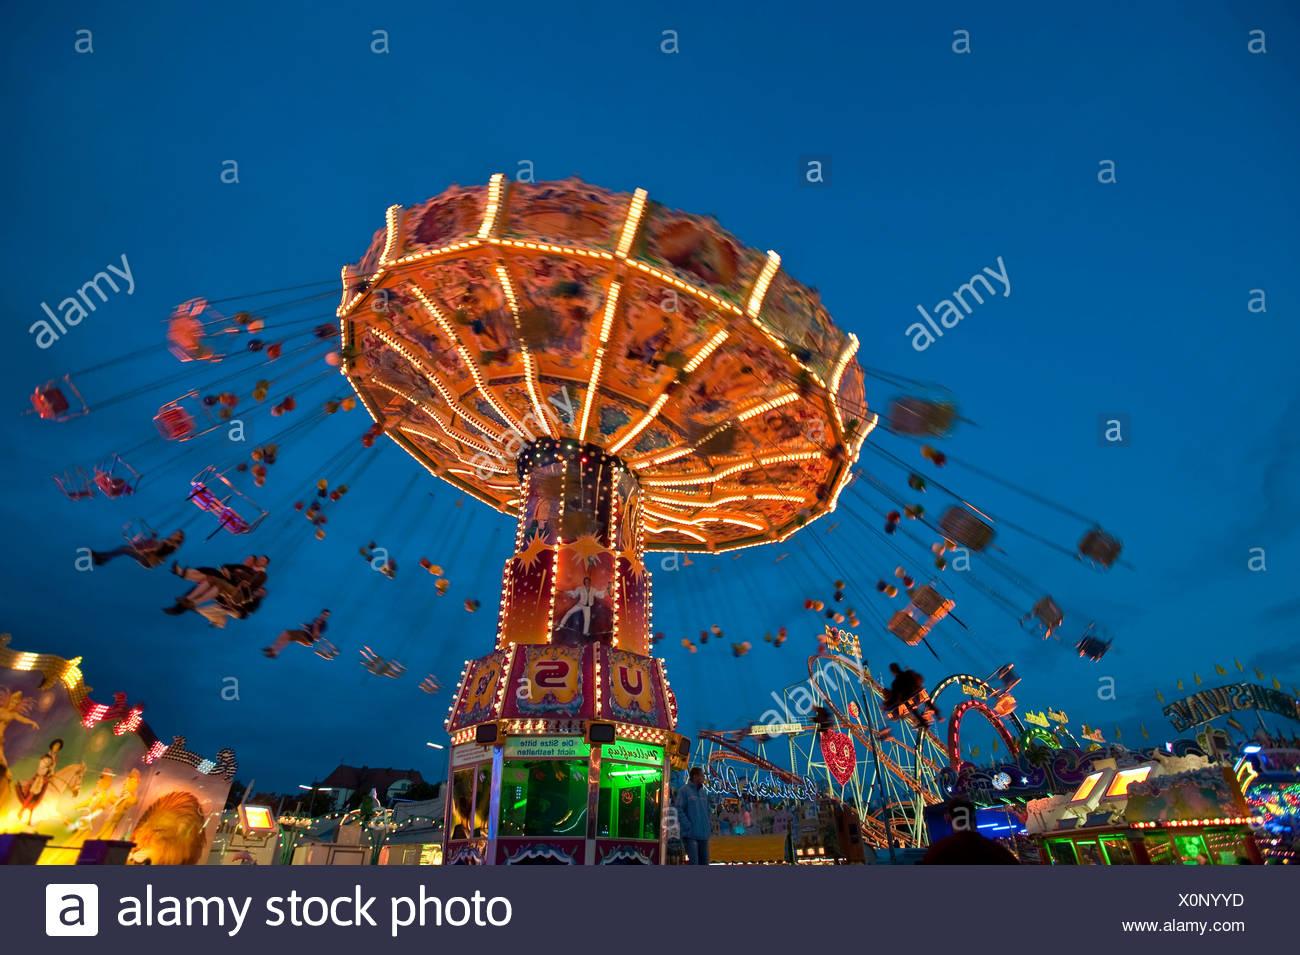 Illuminated Chairoplane at dusk, Oktoberfest festival, Munich, Bavaria, Germany Stock Photo